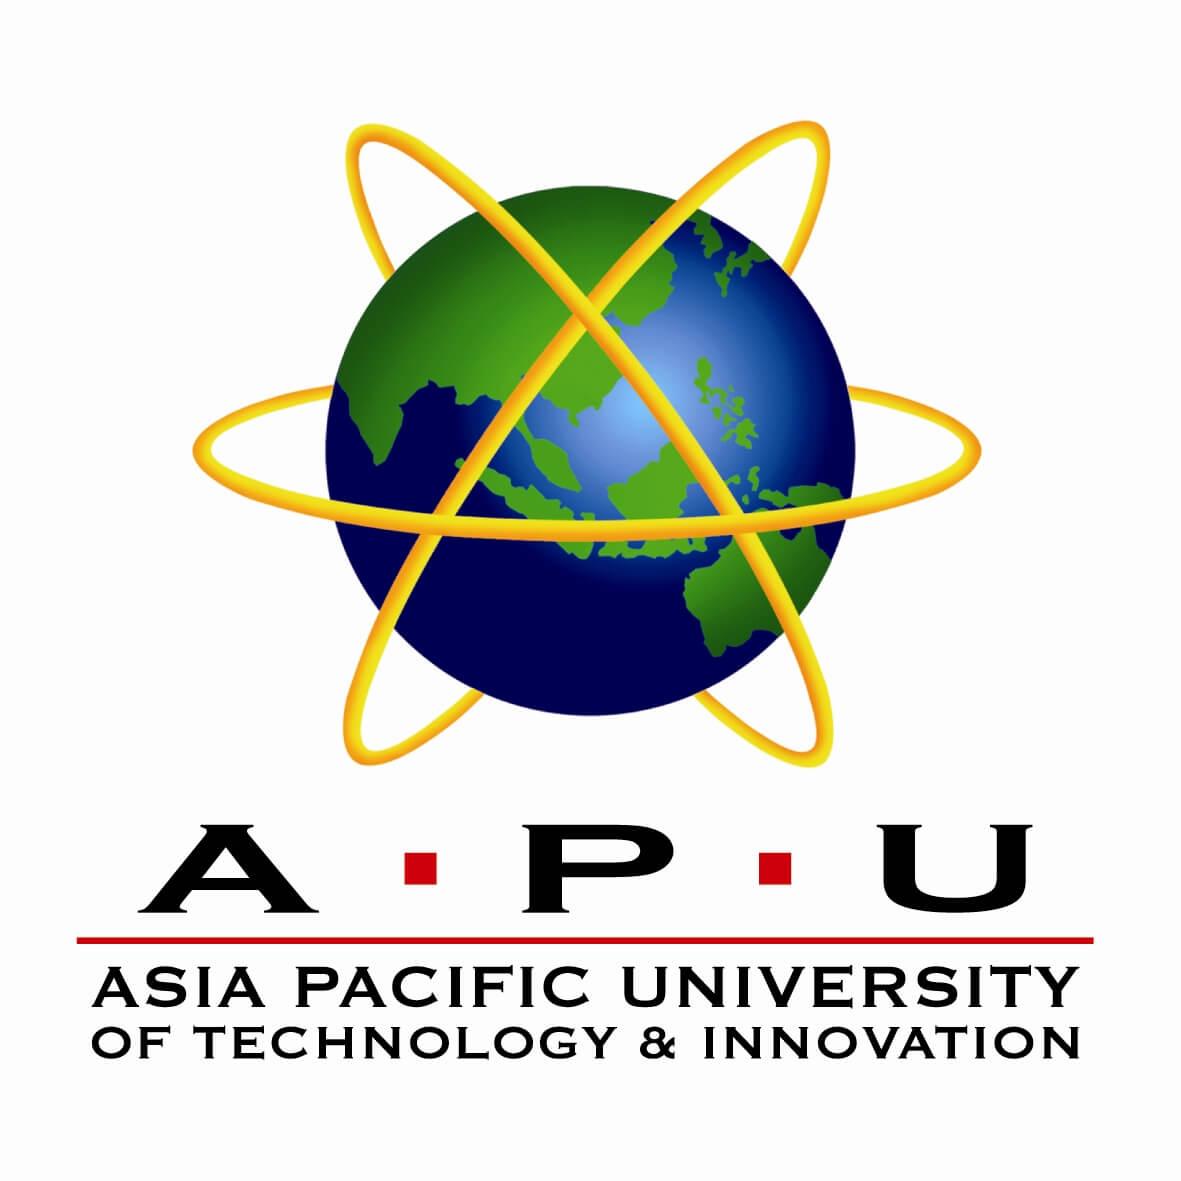 Asia Pacific University of Technology & Innovation (APU) Logo